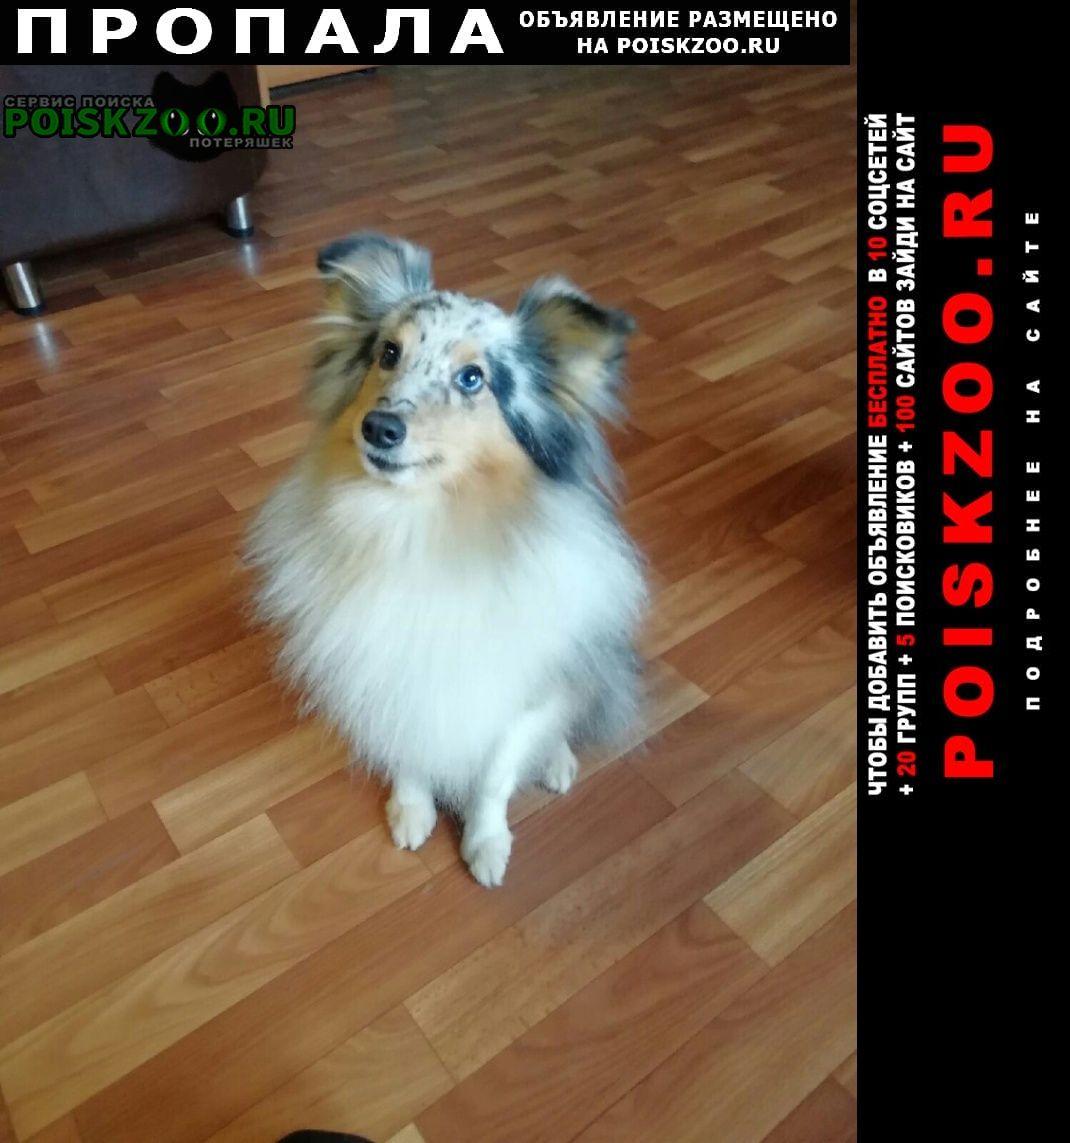 Пропала собака породы шелти Санкт-Петербург